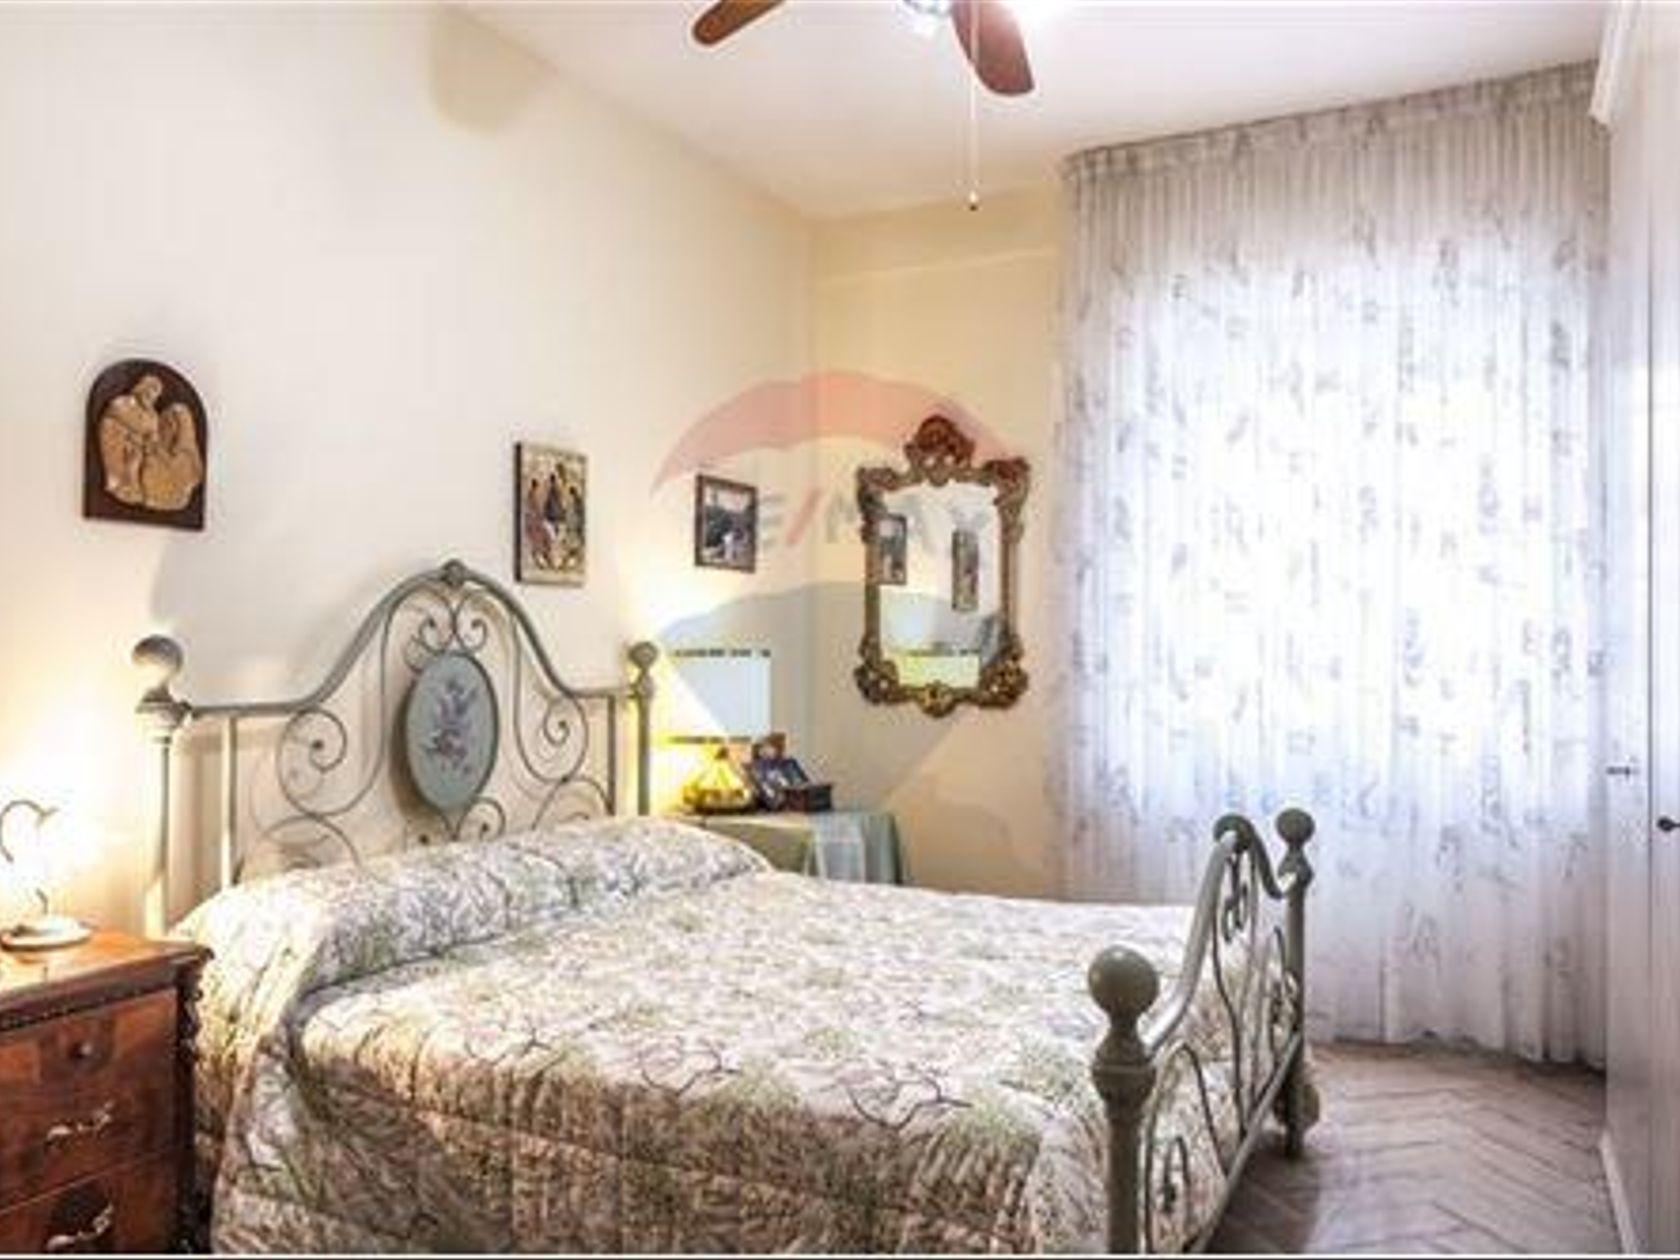 Appartamento Japigia, Bari, BA Vendita - Foto 4